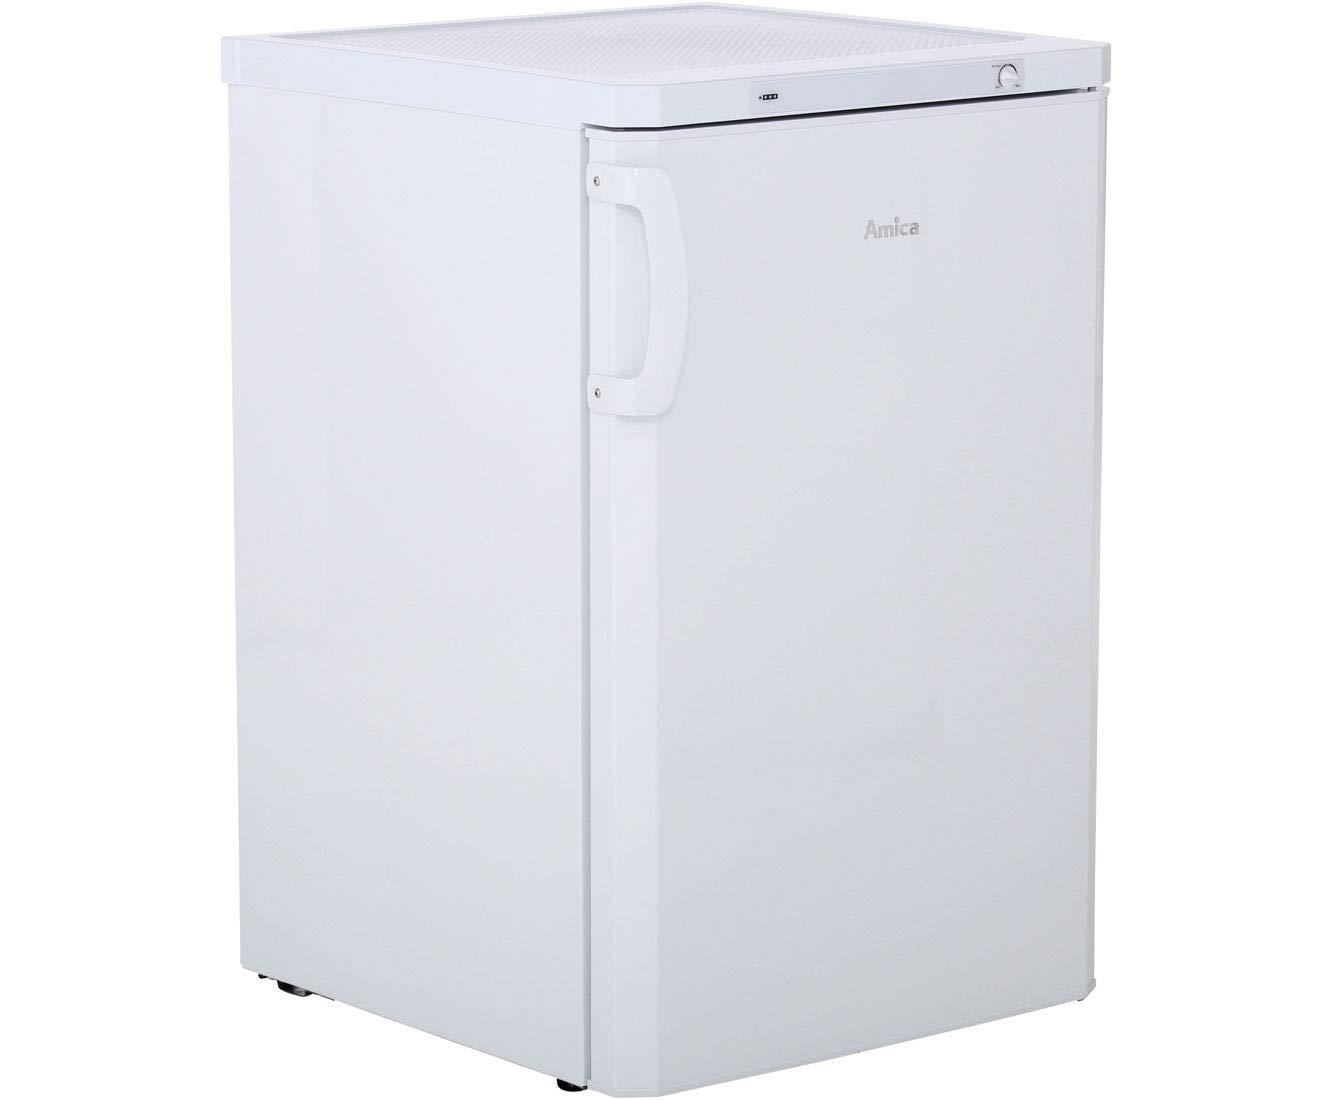 Amica Kühlschrank Thermostat Defekt : Amica gs w gefriergerät a liters amazon elektro